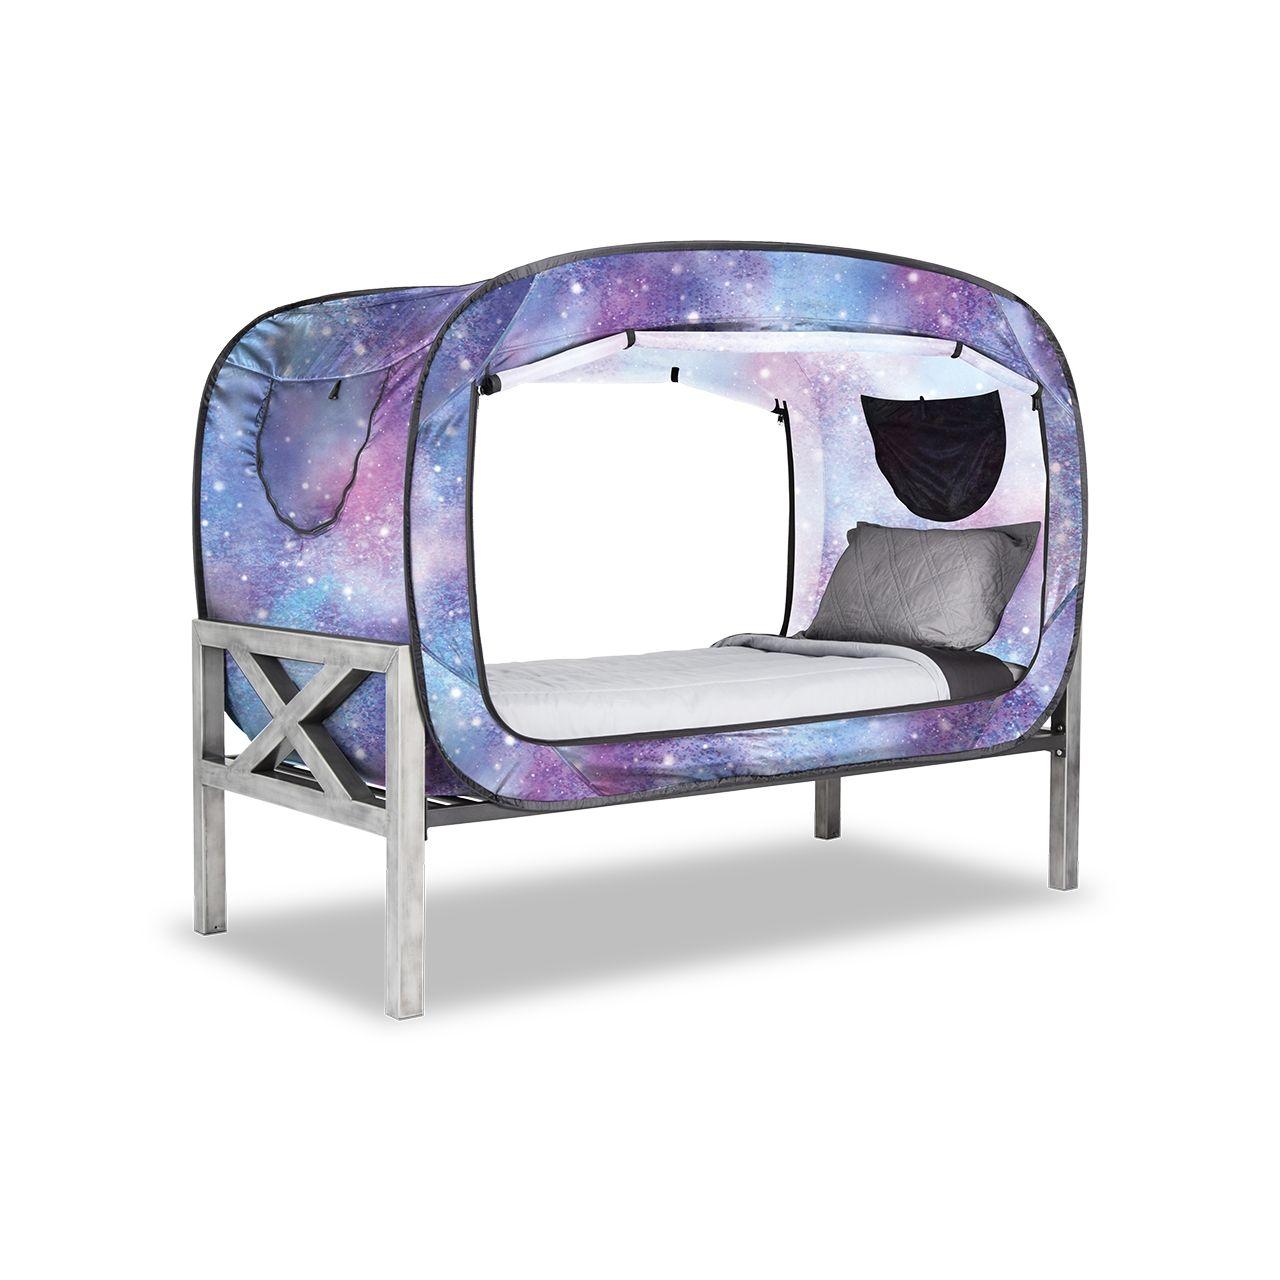 big sale 528e8 eccfe The Bed Tent Unicorn Galaxy | Cute in 2019 | Bed tent, Bed, Tent